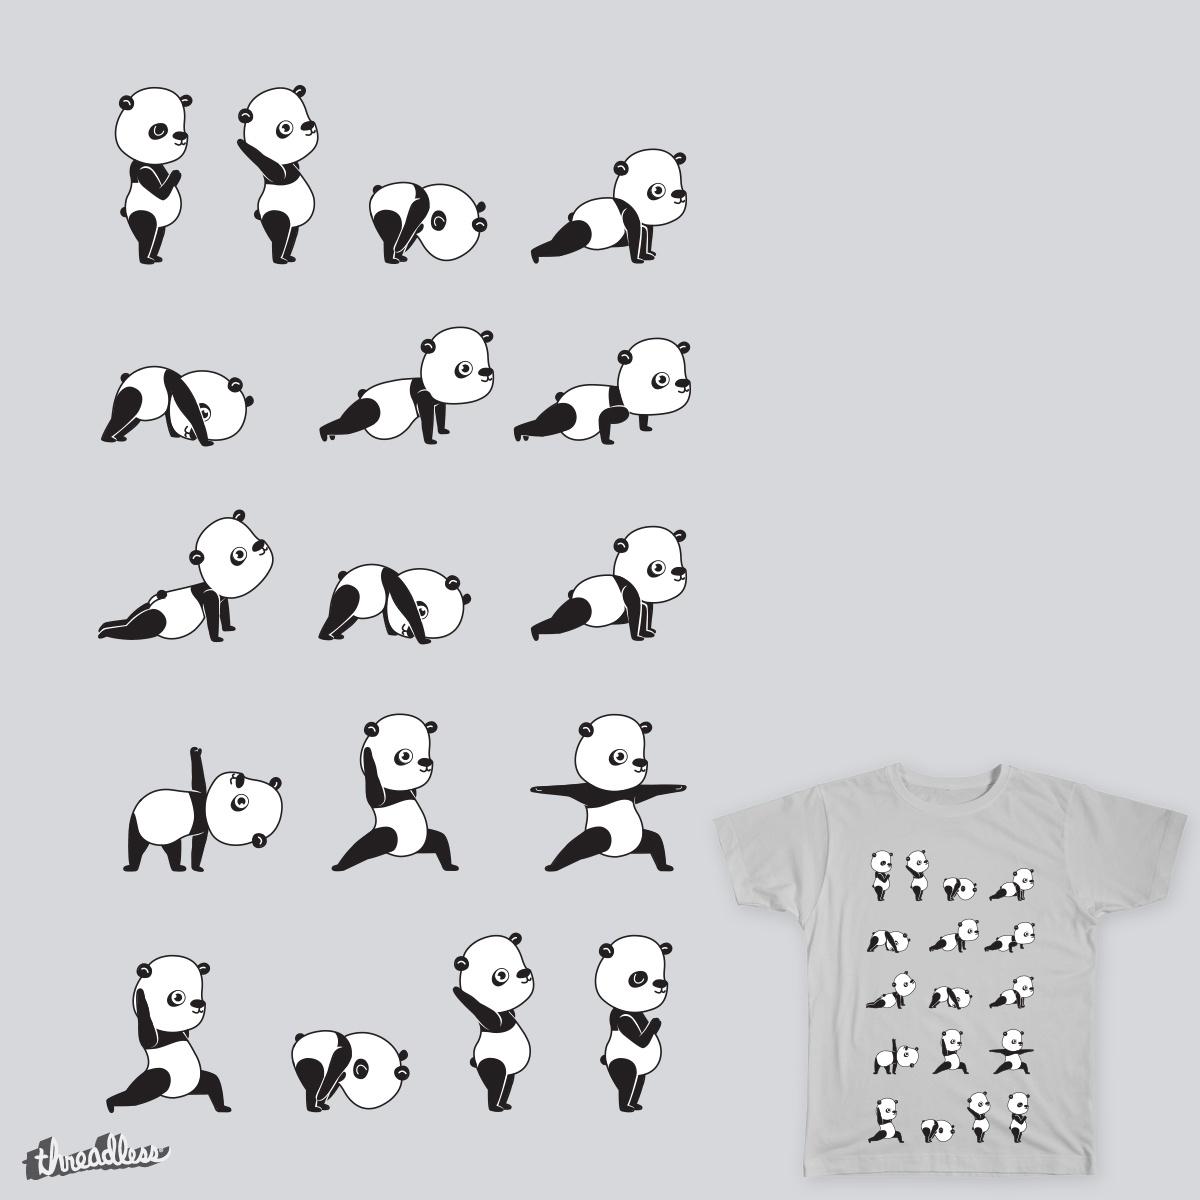 Yoga Bear - Panda by ivejustquitsmoking on Threadless